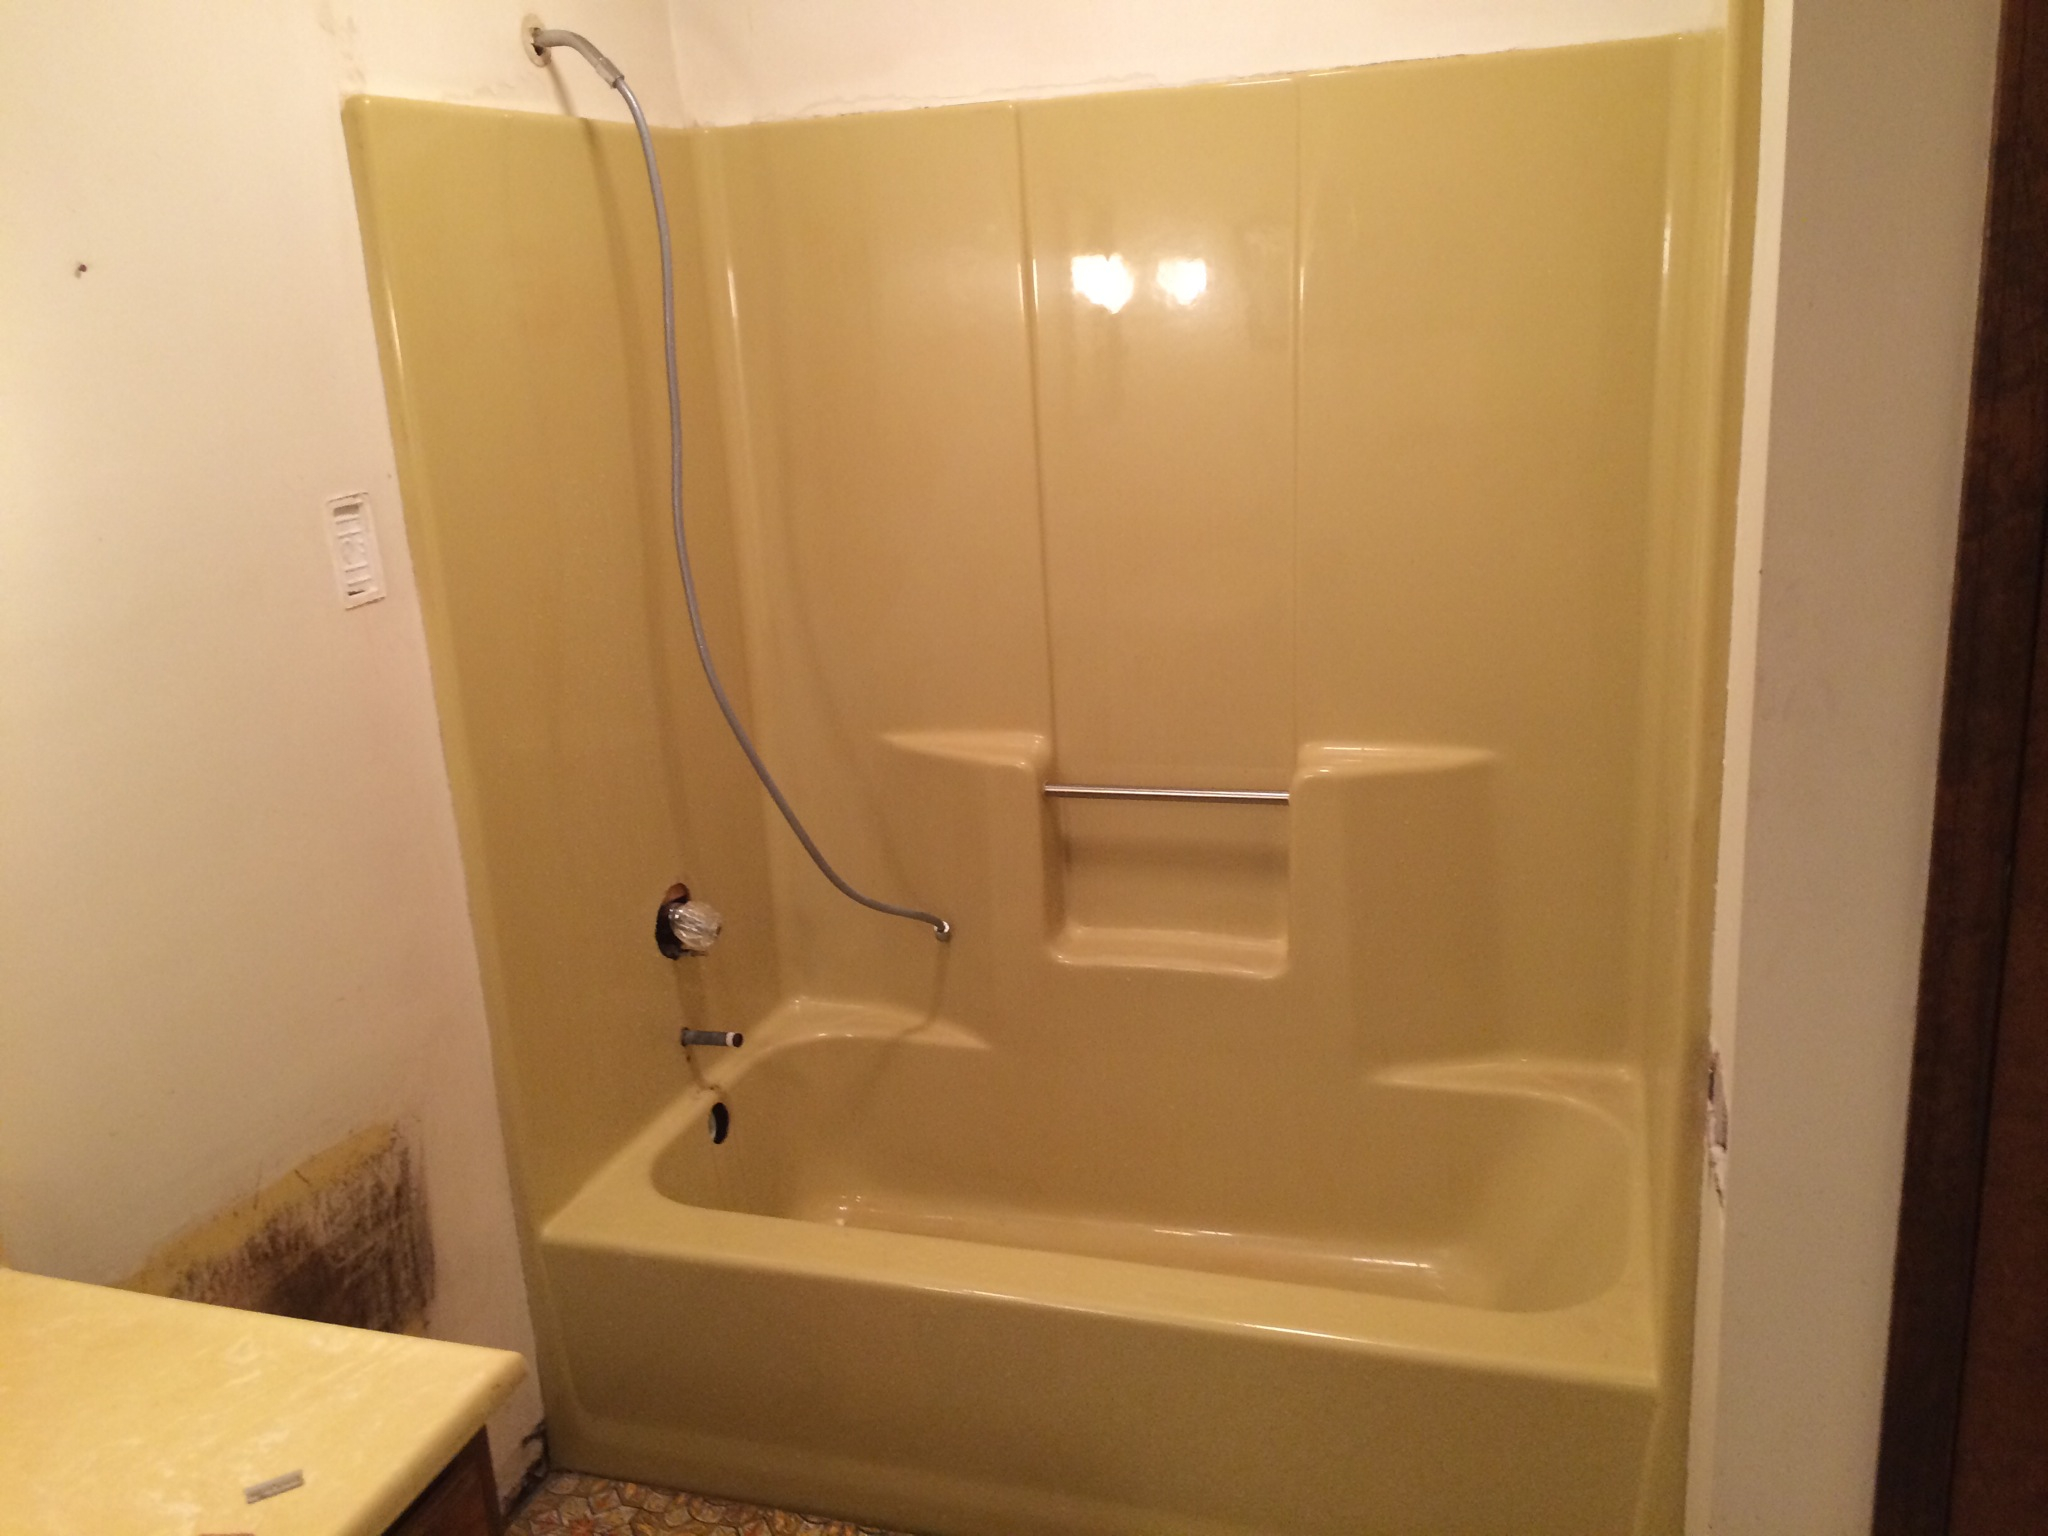 Best Rated Bathtub Refinishing Kit • Bathtub Ideas